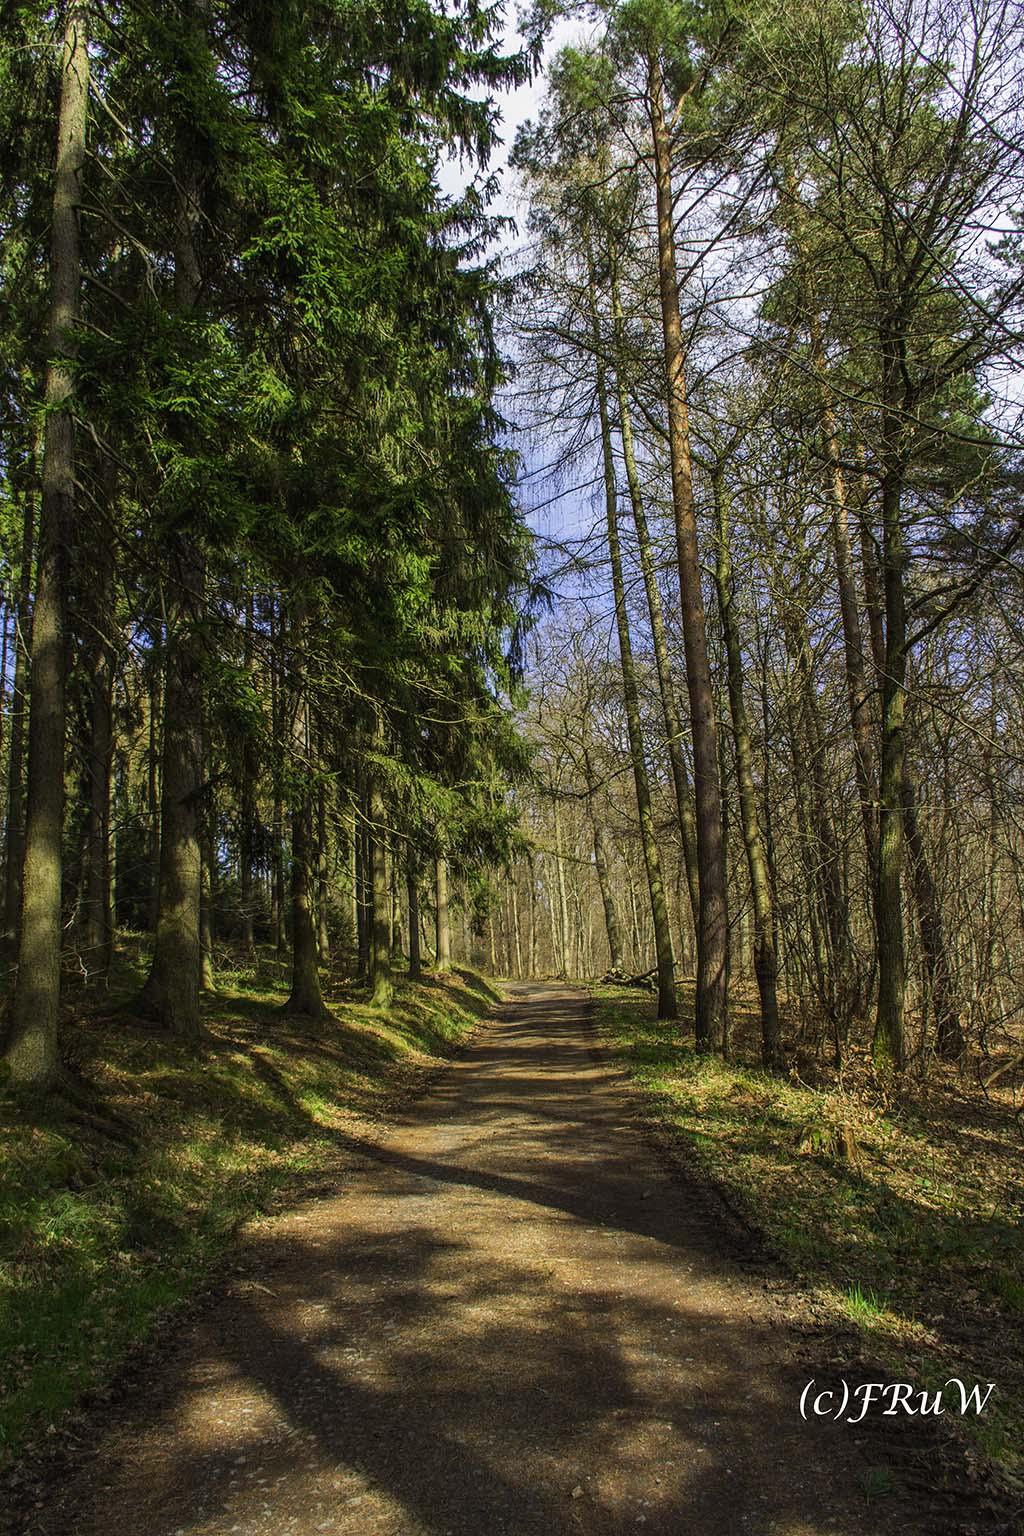 Eisenweg_No5 (38).jpg